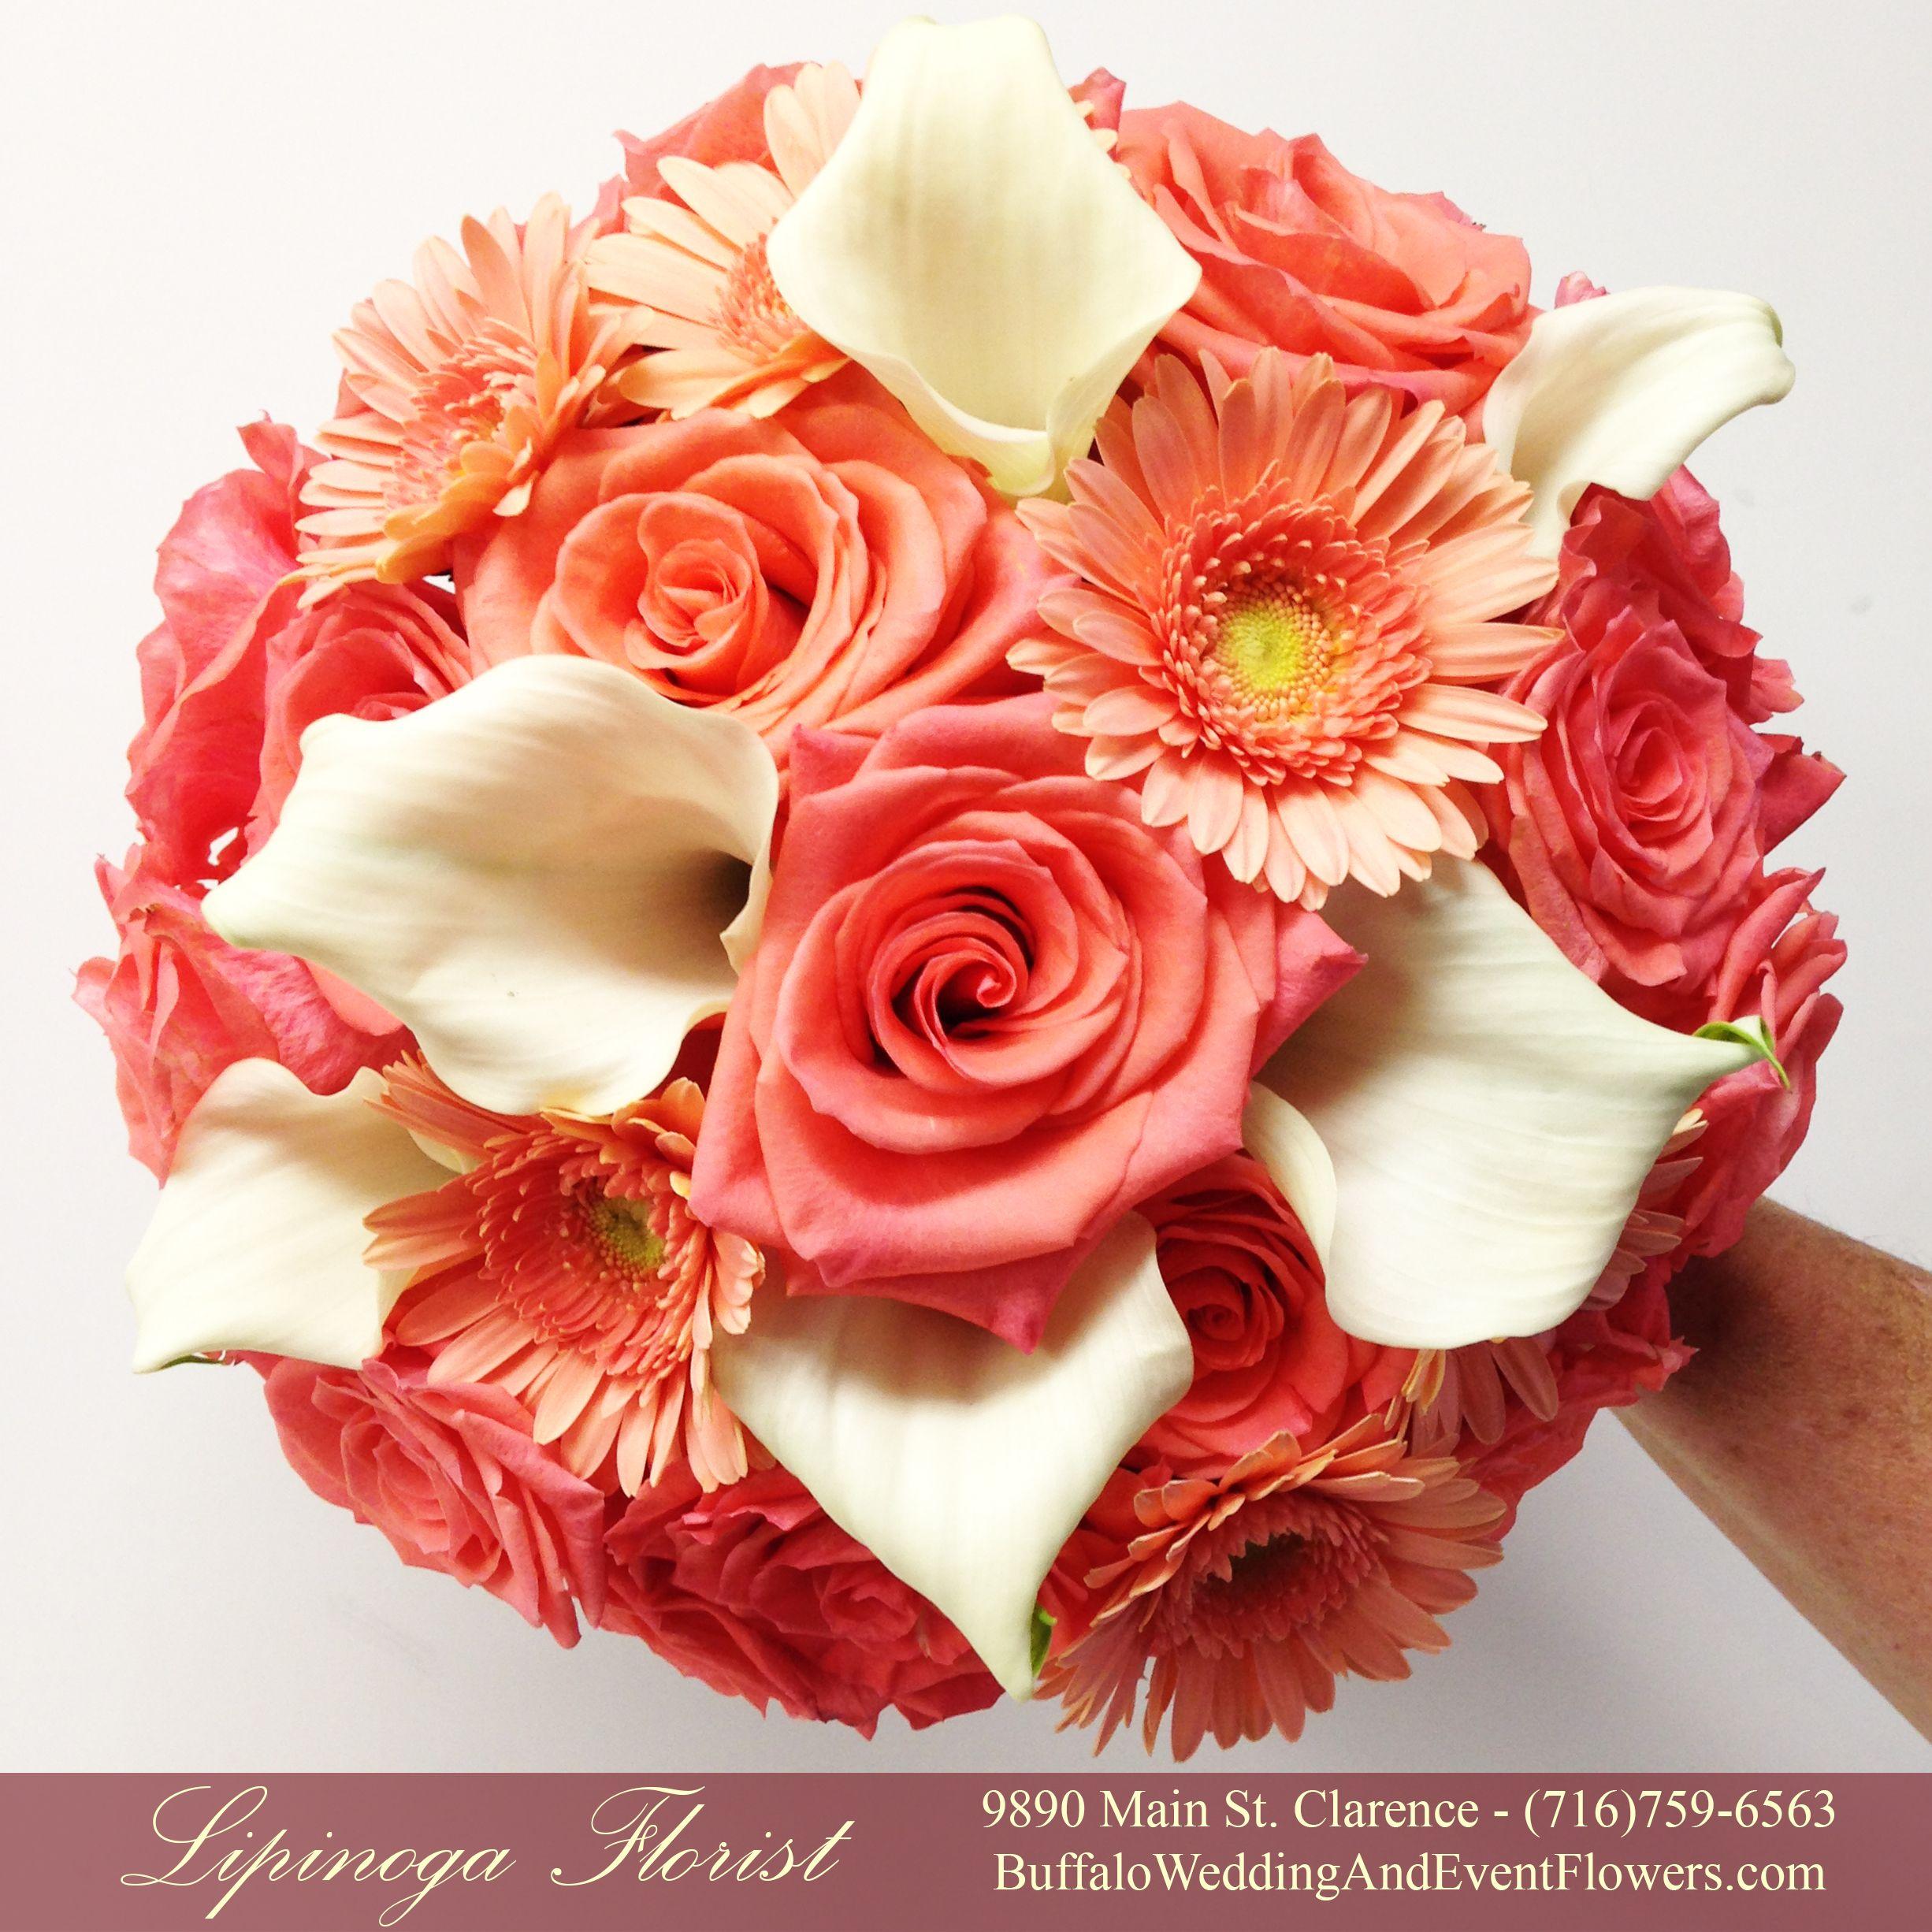 Mini Calla Lilies Gerbera Daisies Roses Flower Bouquet Wedding